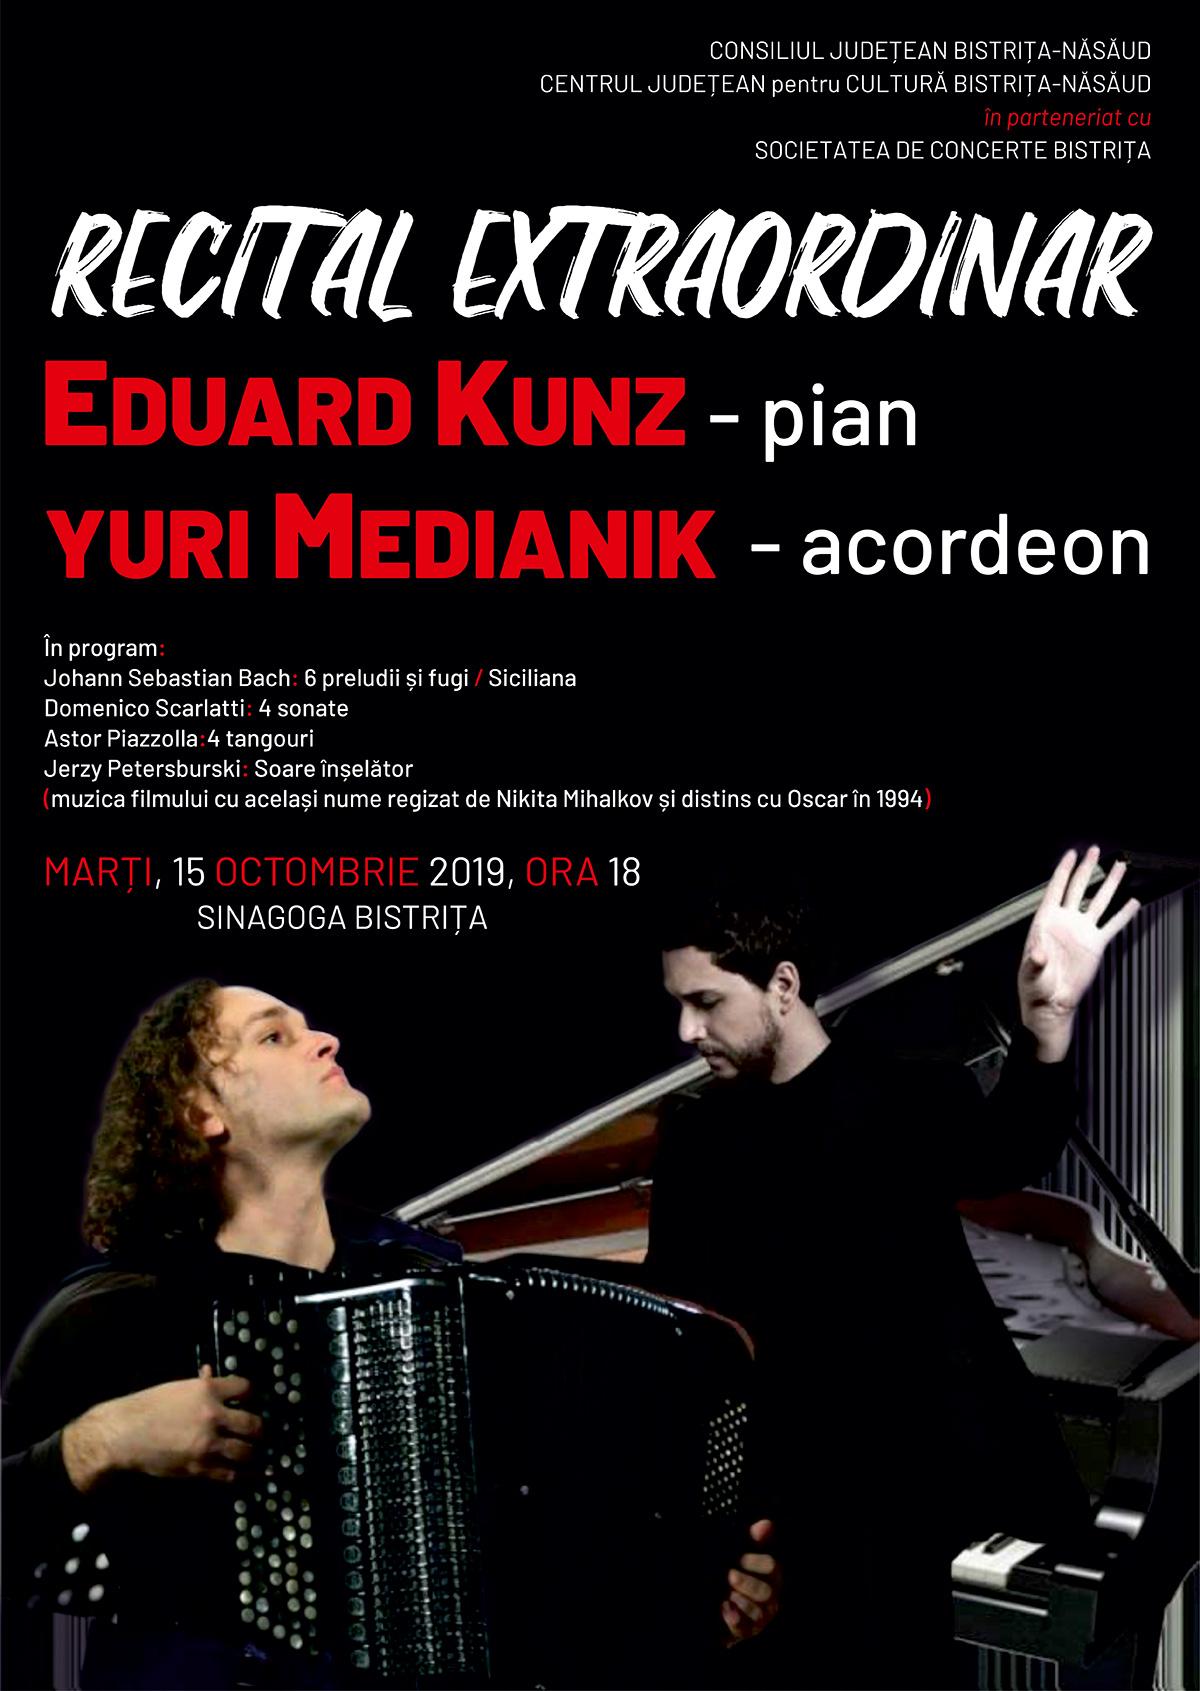 Poster Eduard Kunz and YURI MEDIANIK